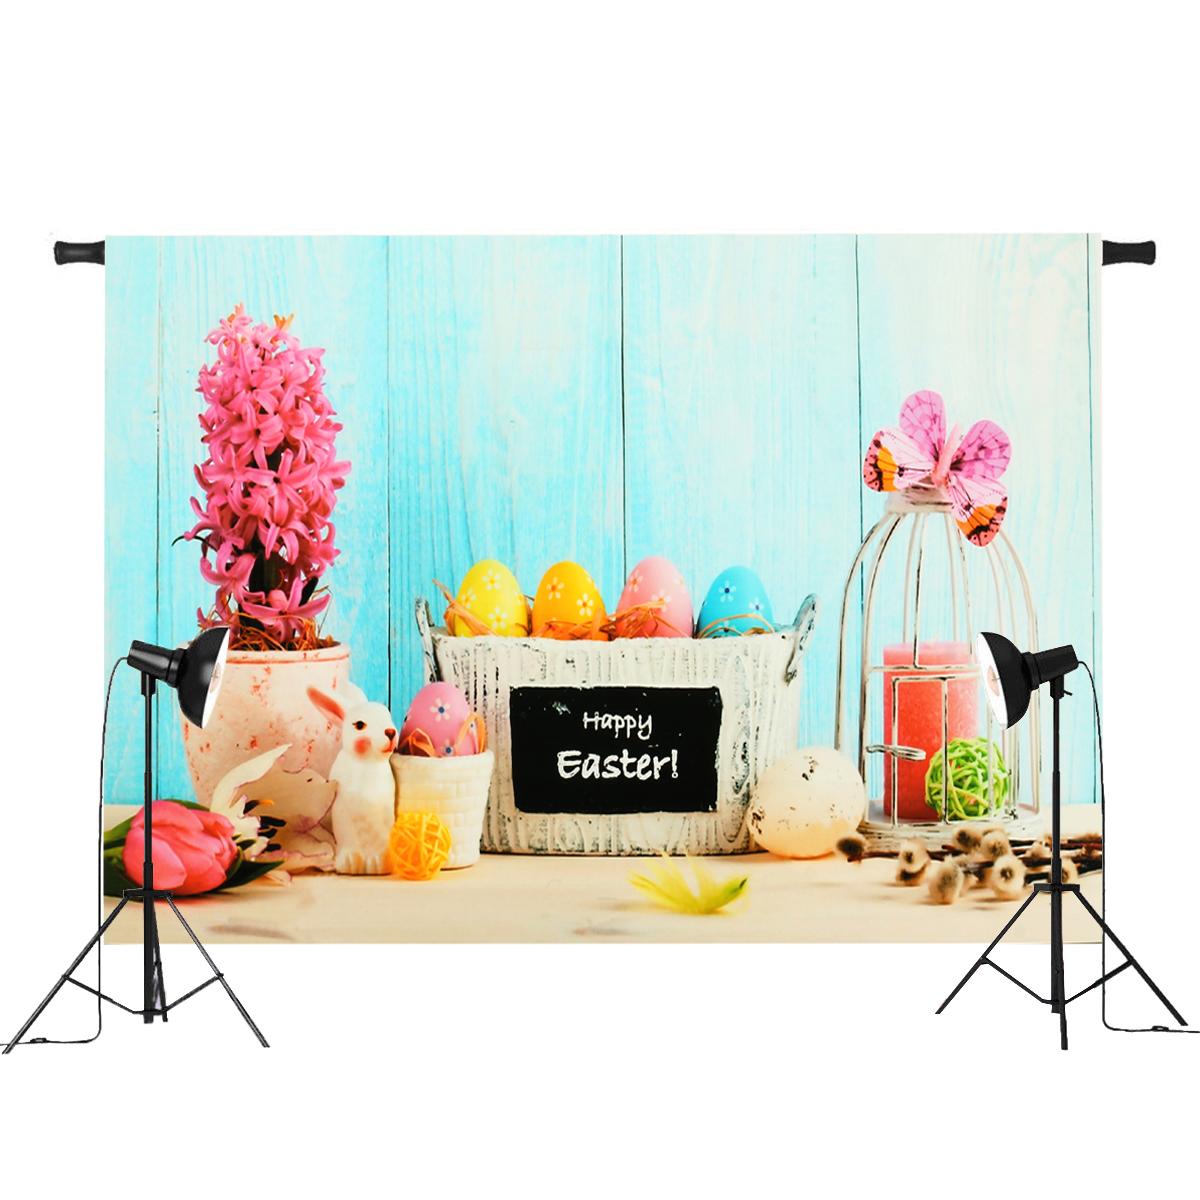 7x5ft/5x3ft Happy Easter Theme Thin Vinyl Photography Backdrop Background Studio Photo Prop